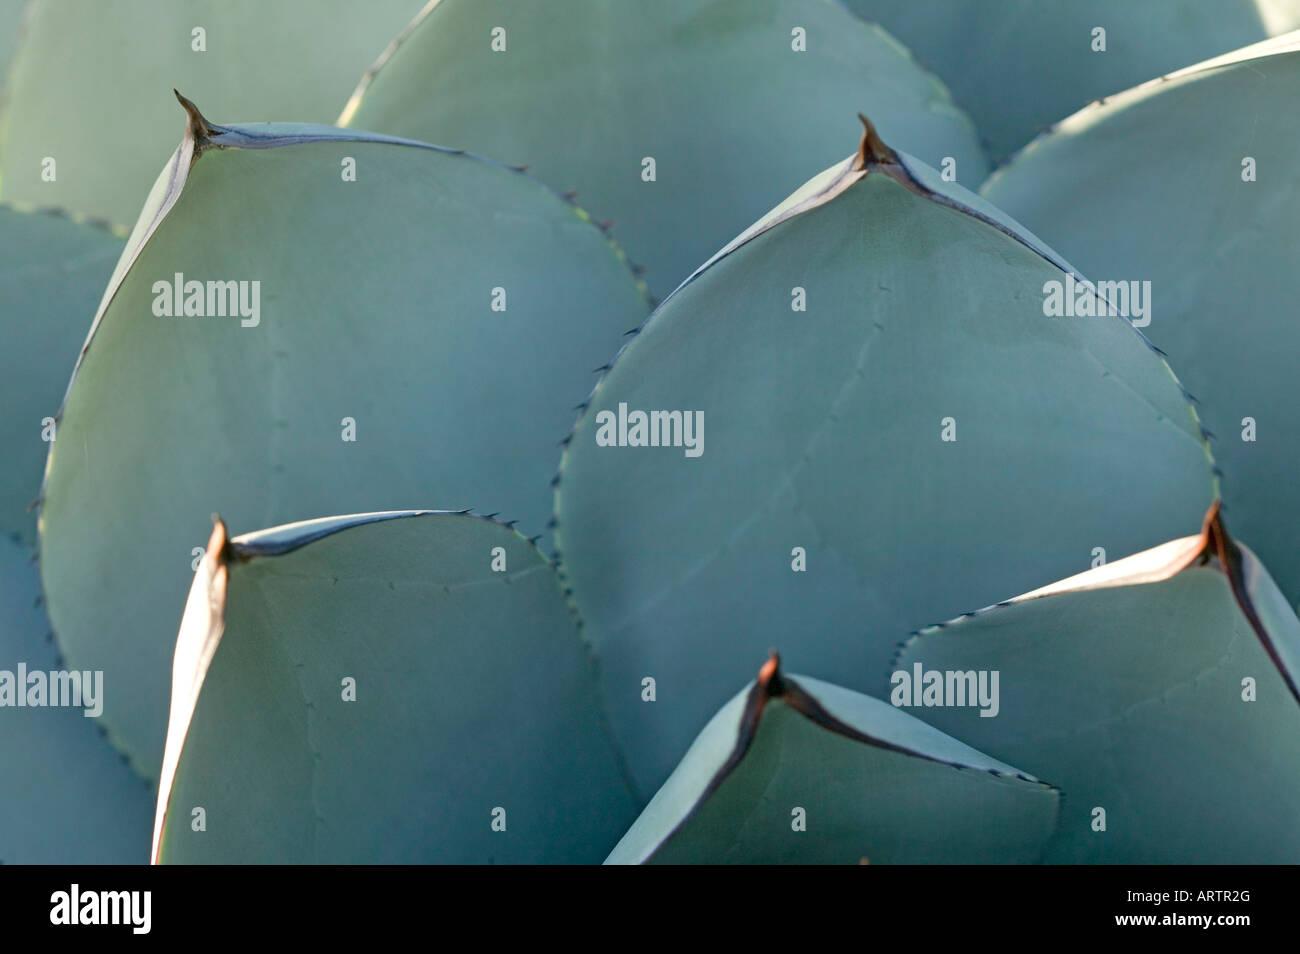 Suculentas cactus Desert Plant Imagen De Stock